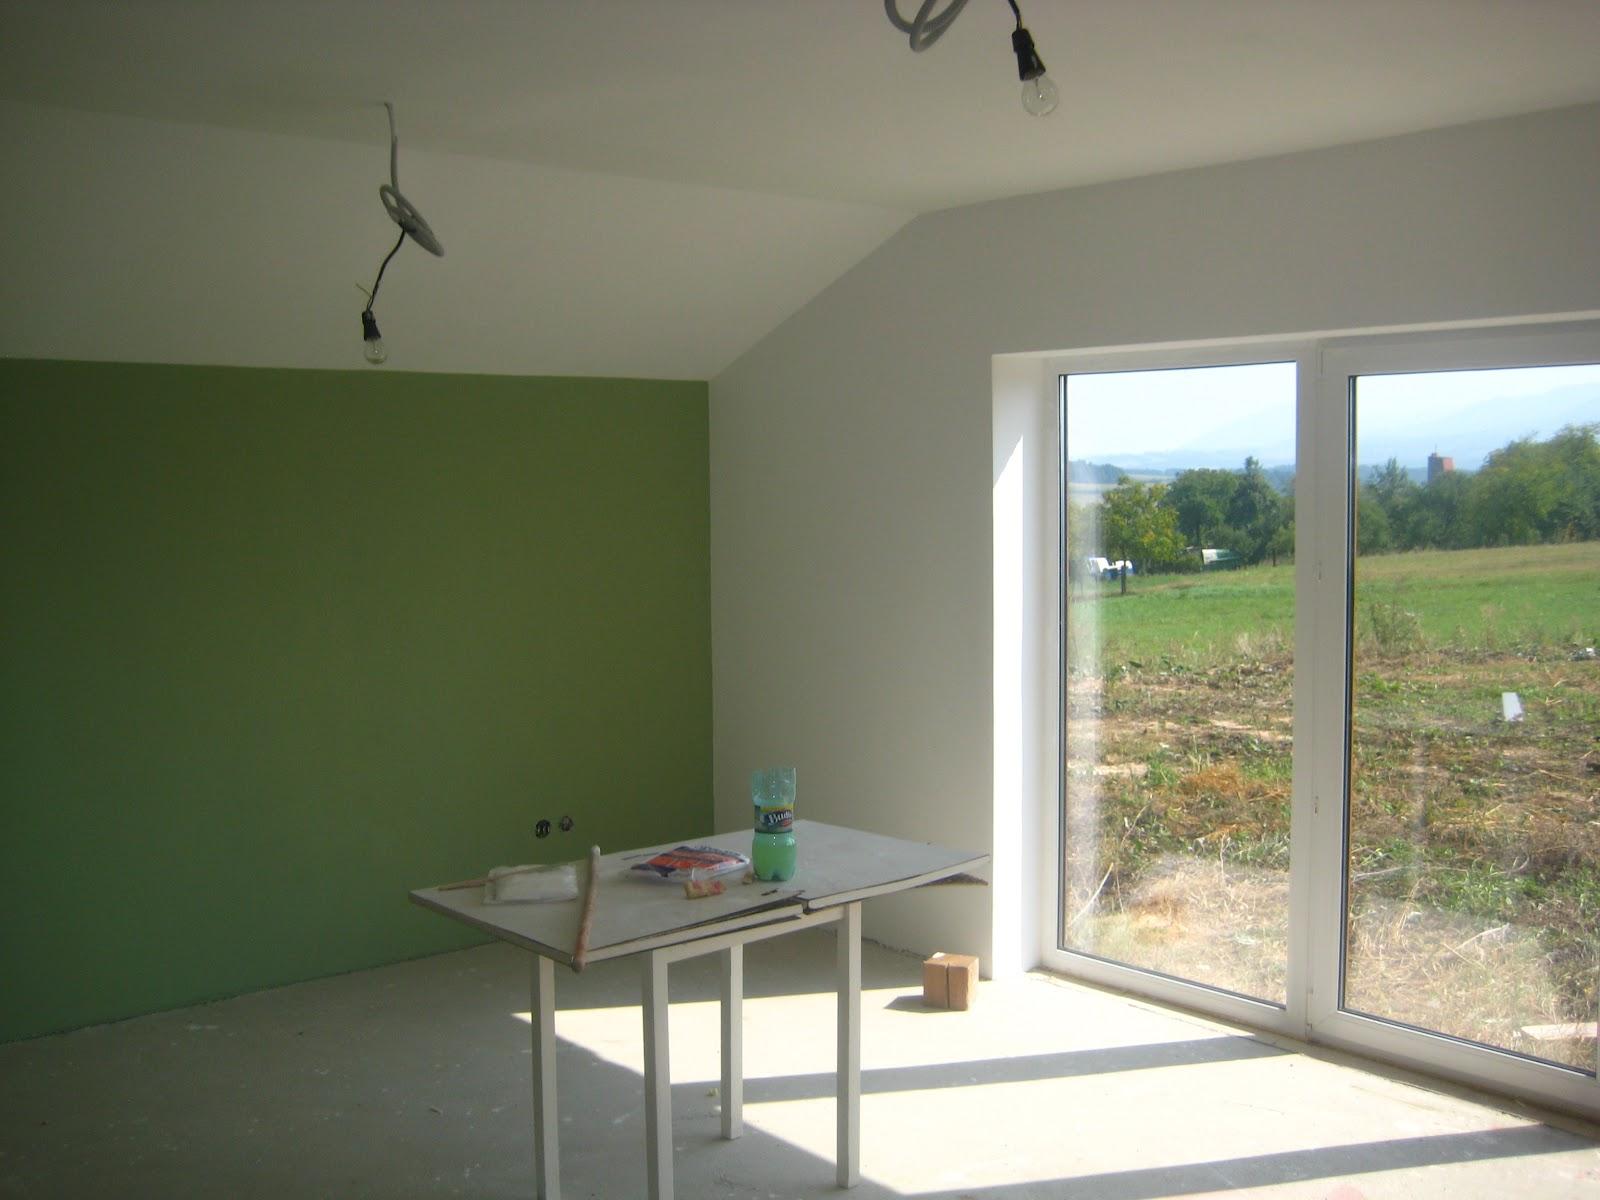 Groene Wand Woonkamer : Slaapkamer groene wand muur kleur one of the best home design